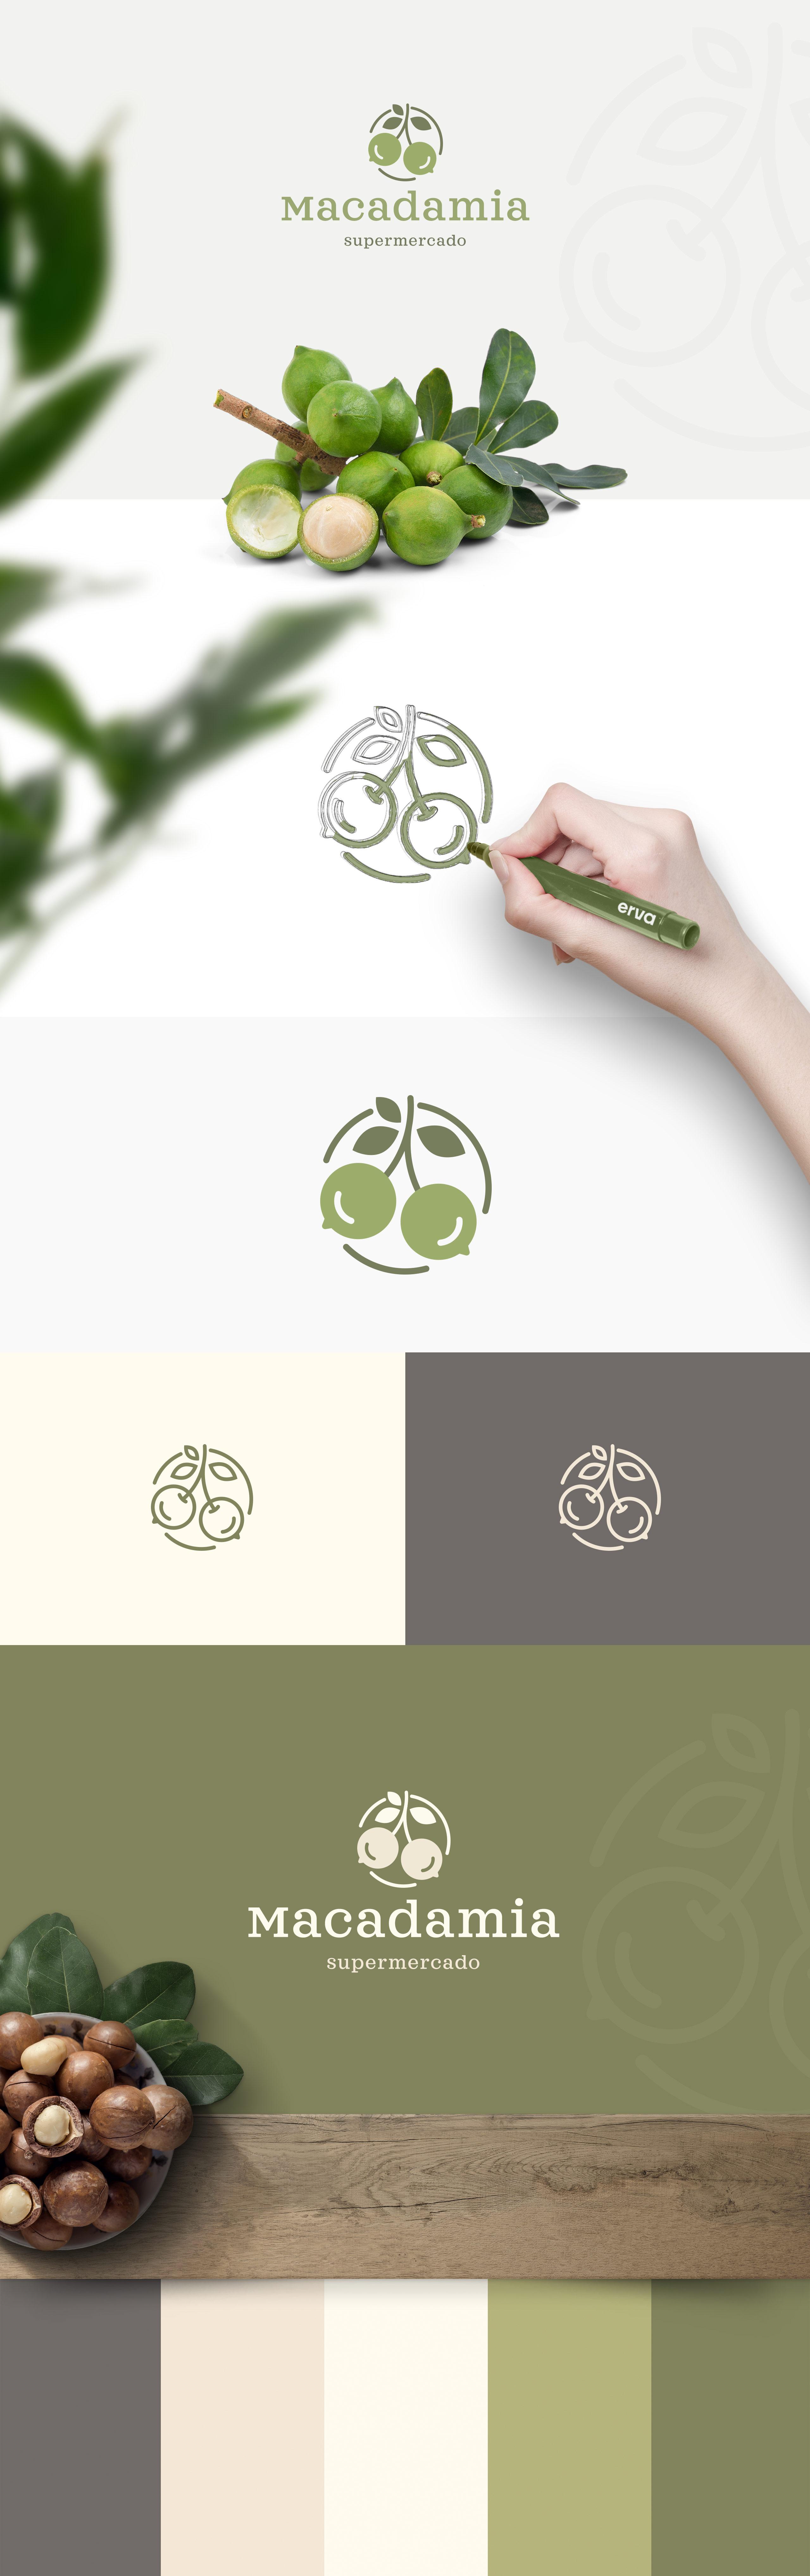 Macadamia Supermercado - Branding by erva